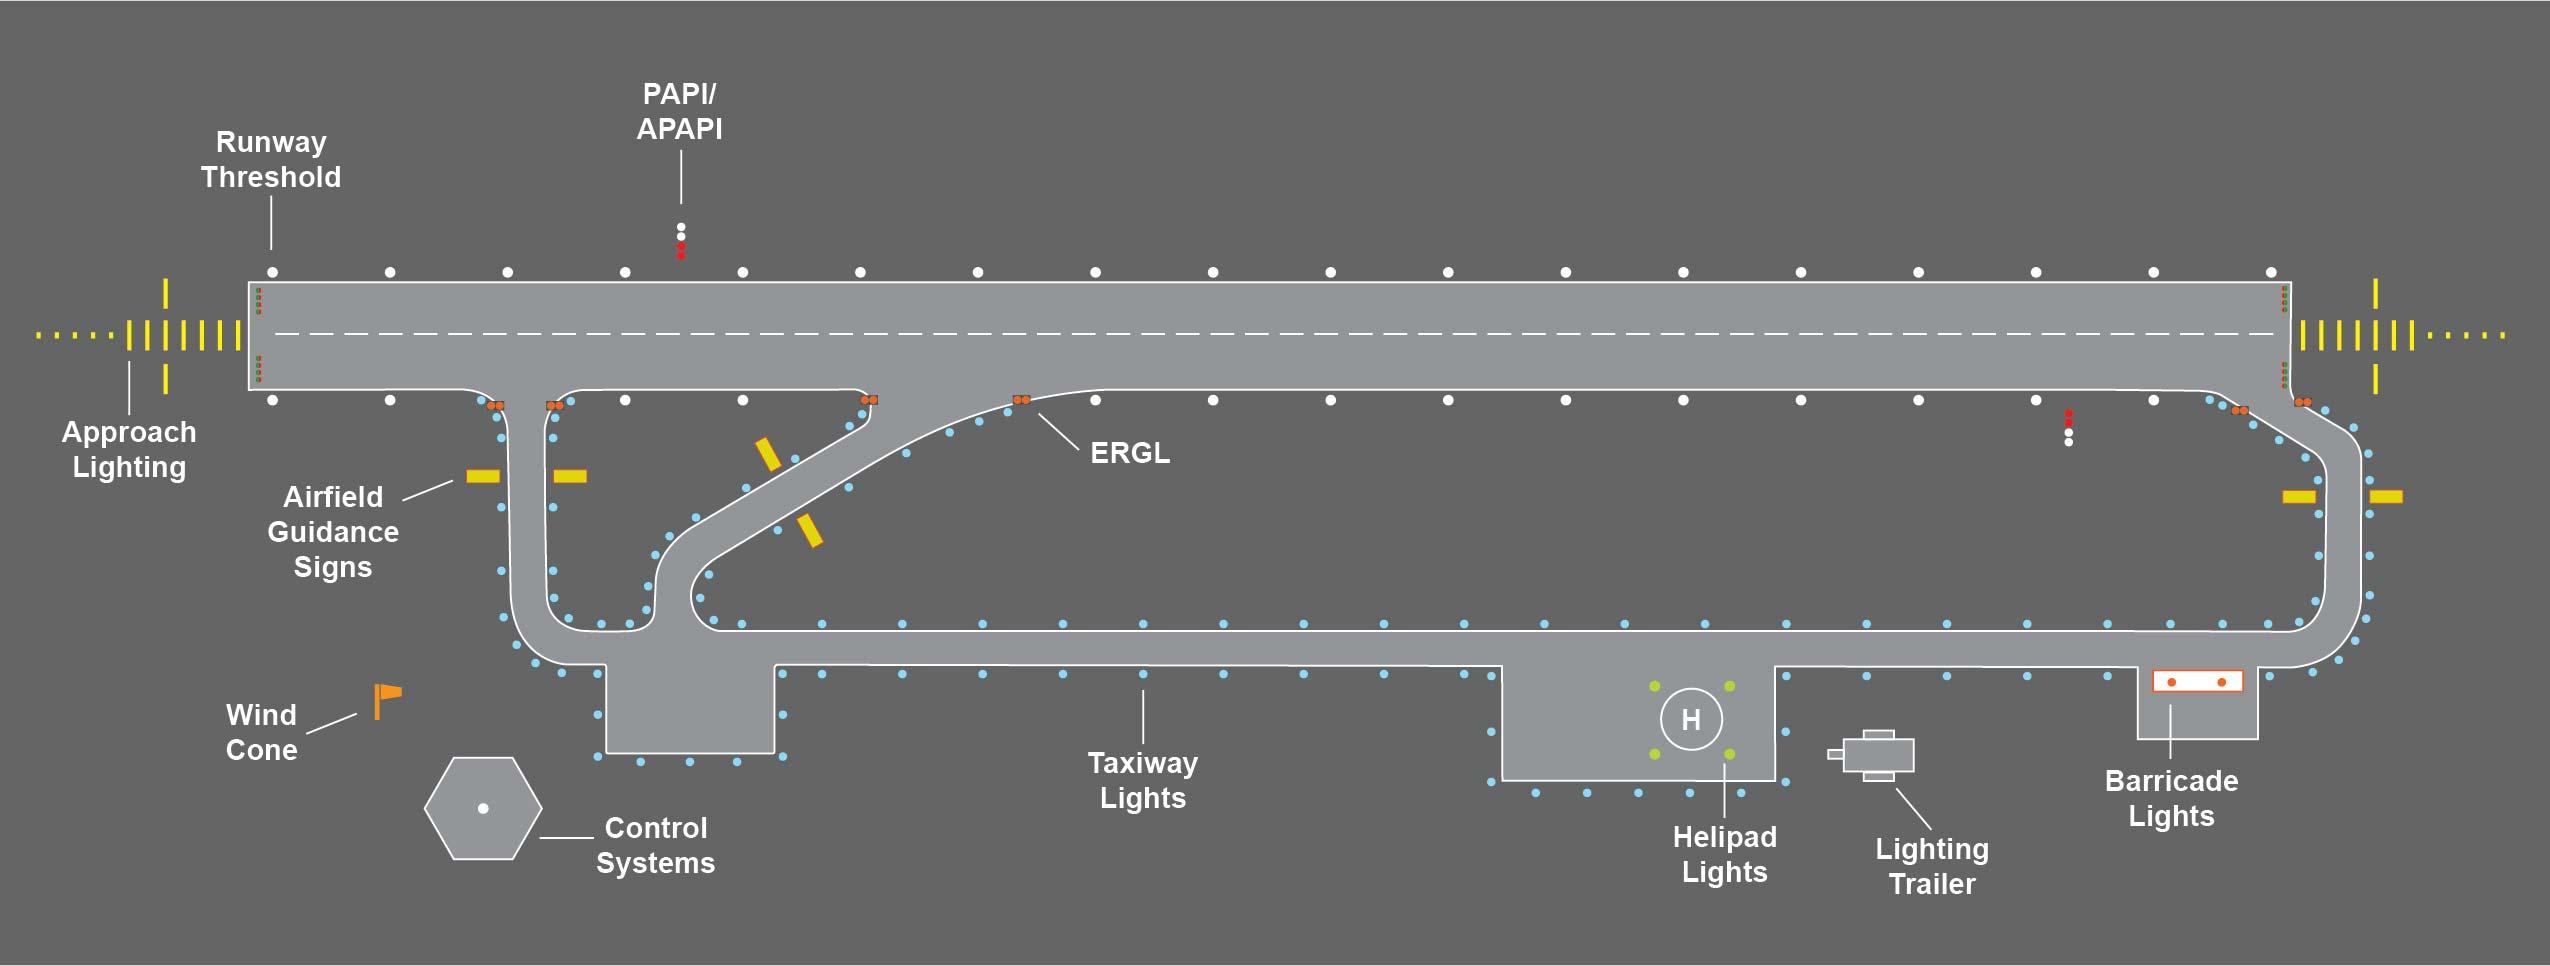 Airport lighting configuration